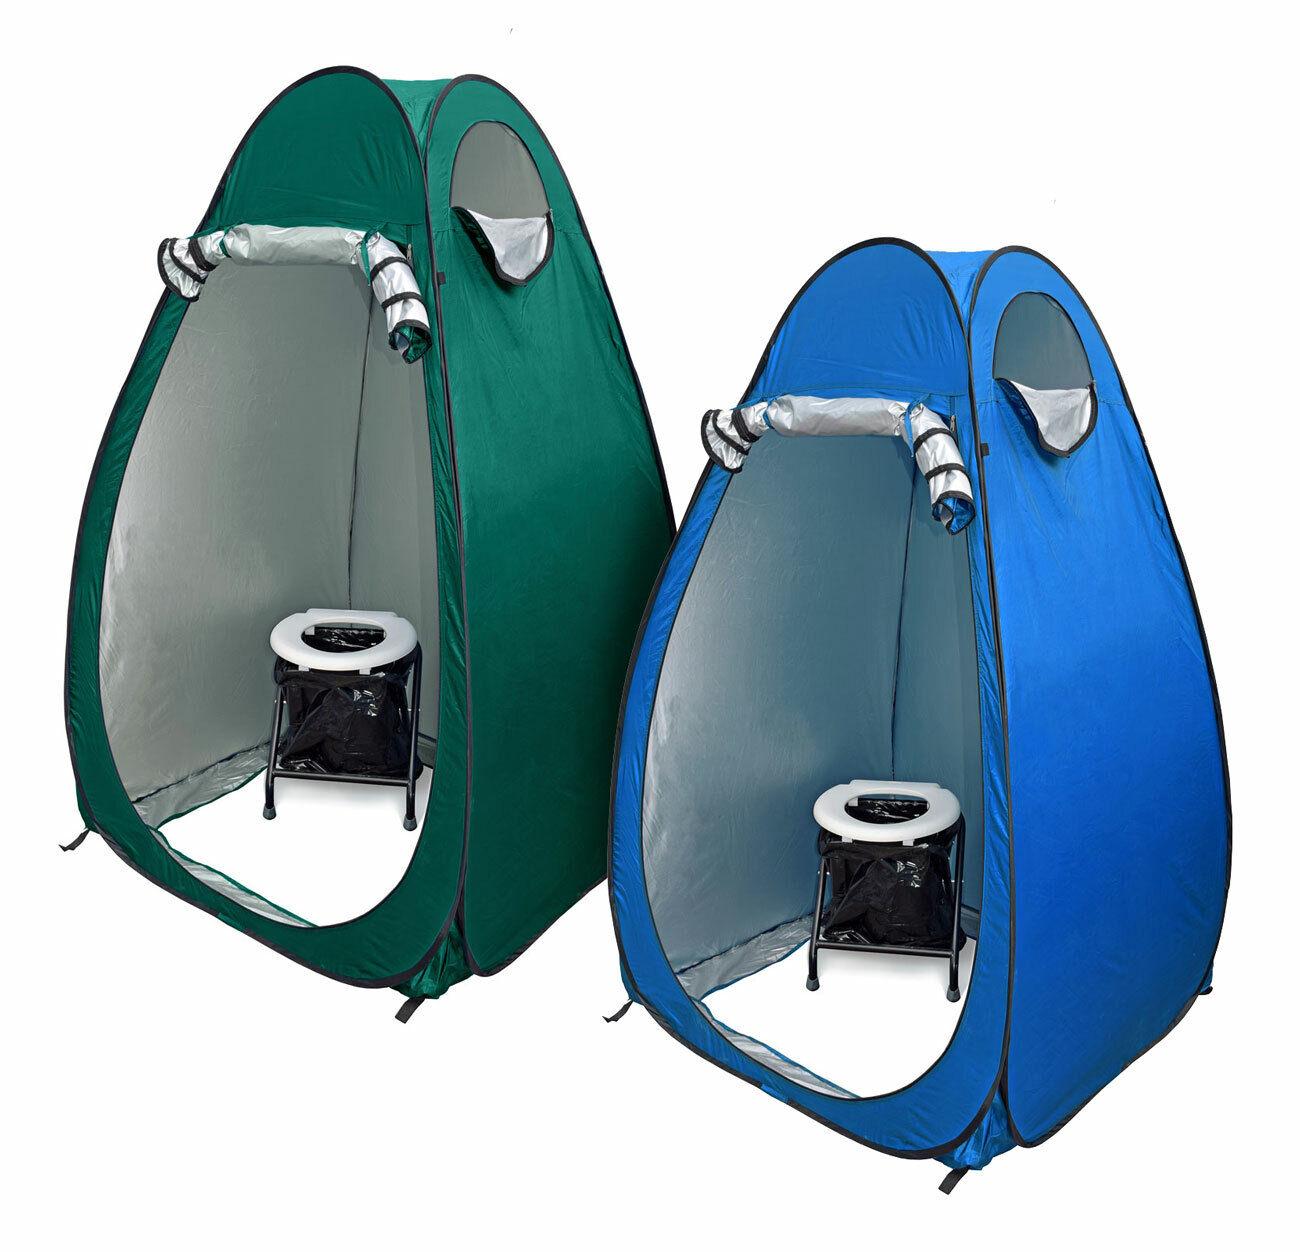 24 Ocean wc borsano set pieghevole TOILETTE autobusTINE popup Tenda duschzelt nello spogliatoio Tenda